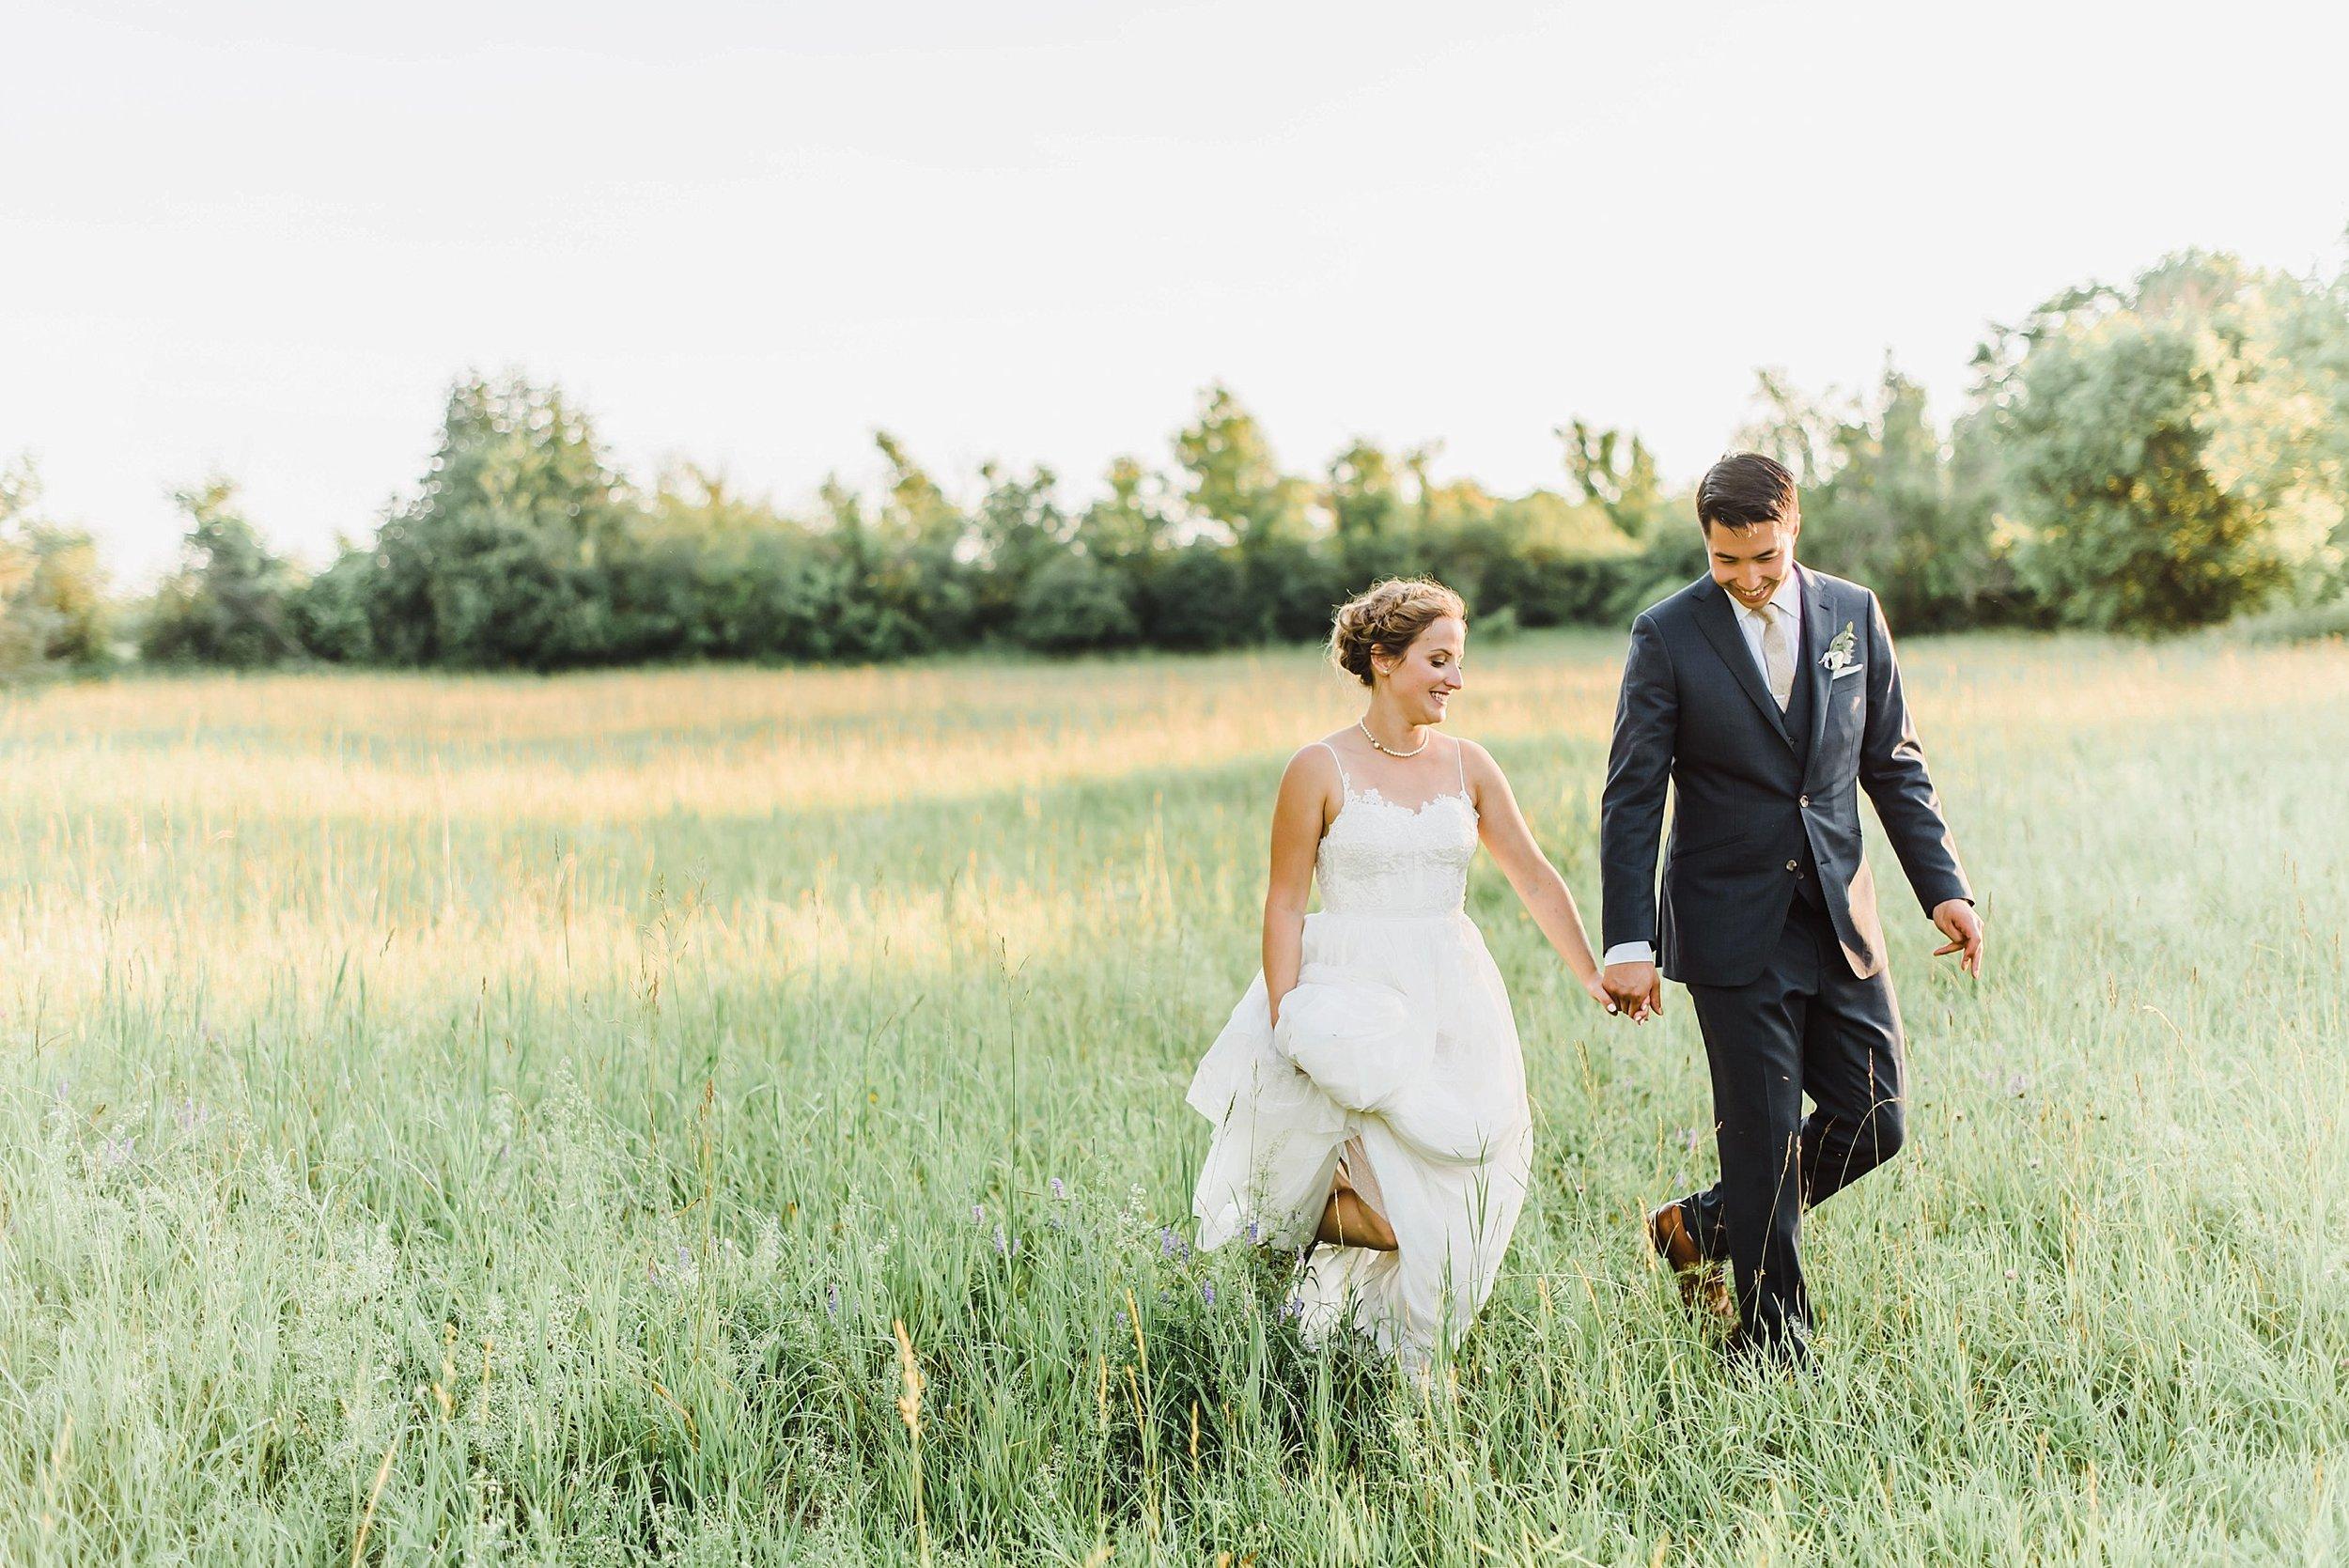 light airy indie fine art ottawa wedding photographer | Ali and Batoul Photography_0909.jpg